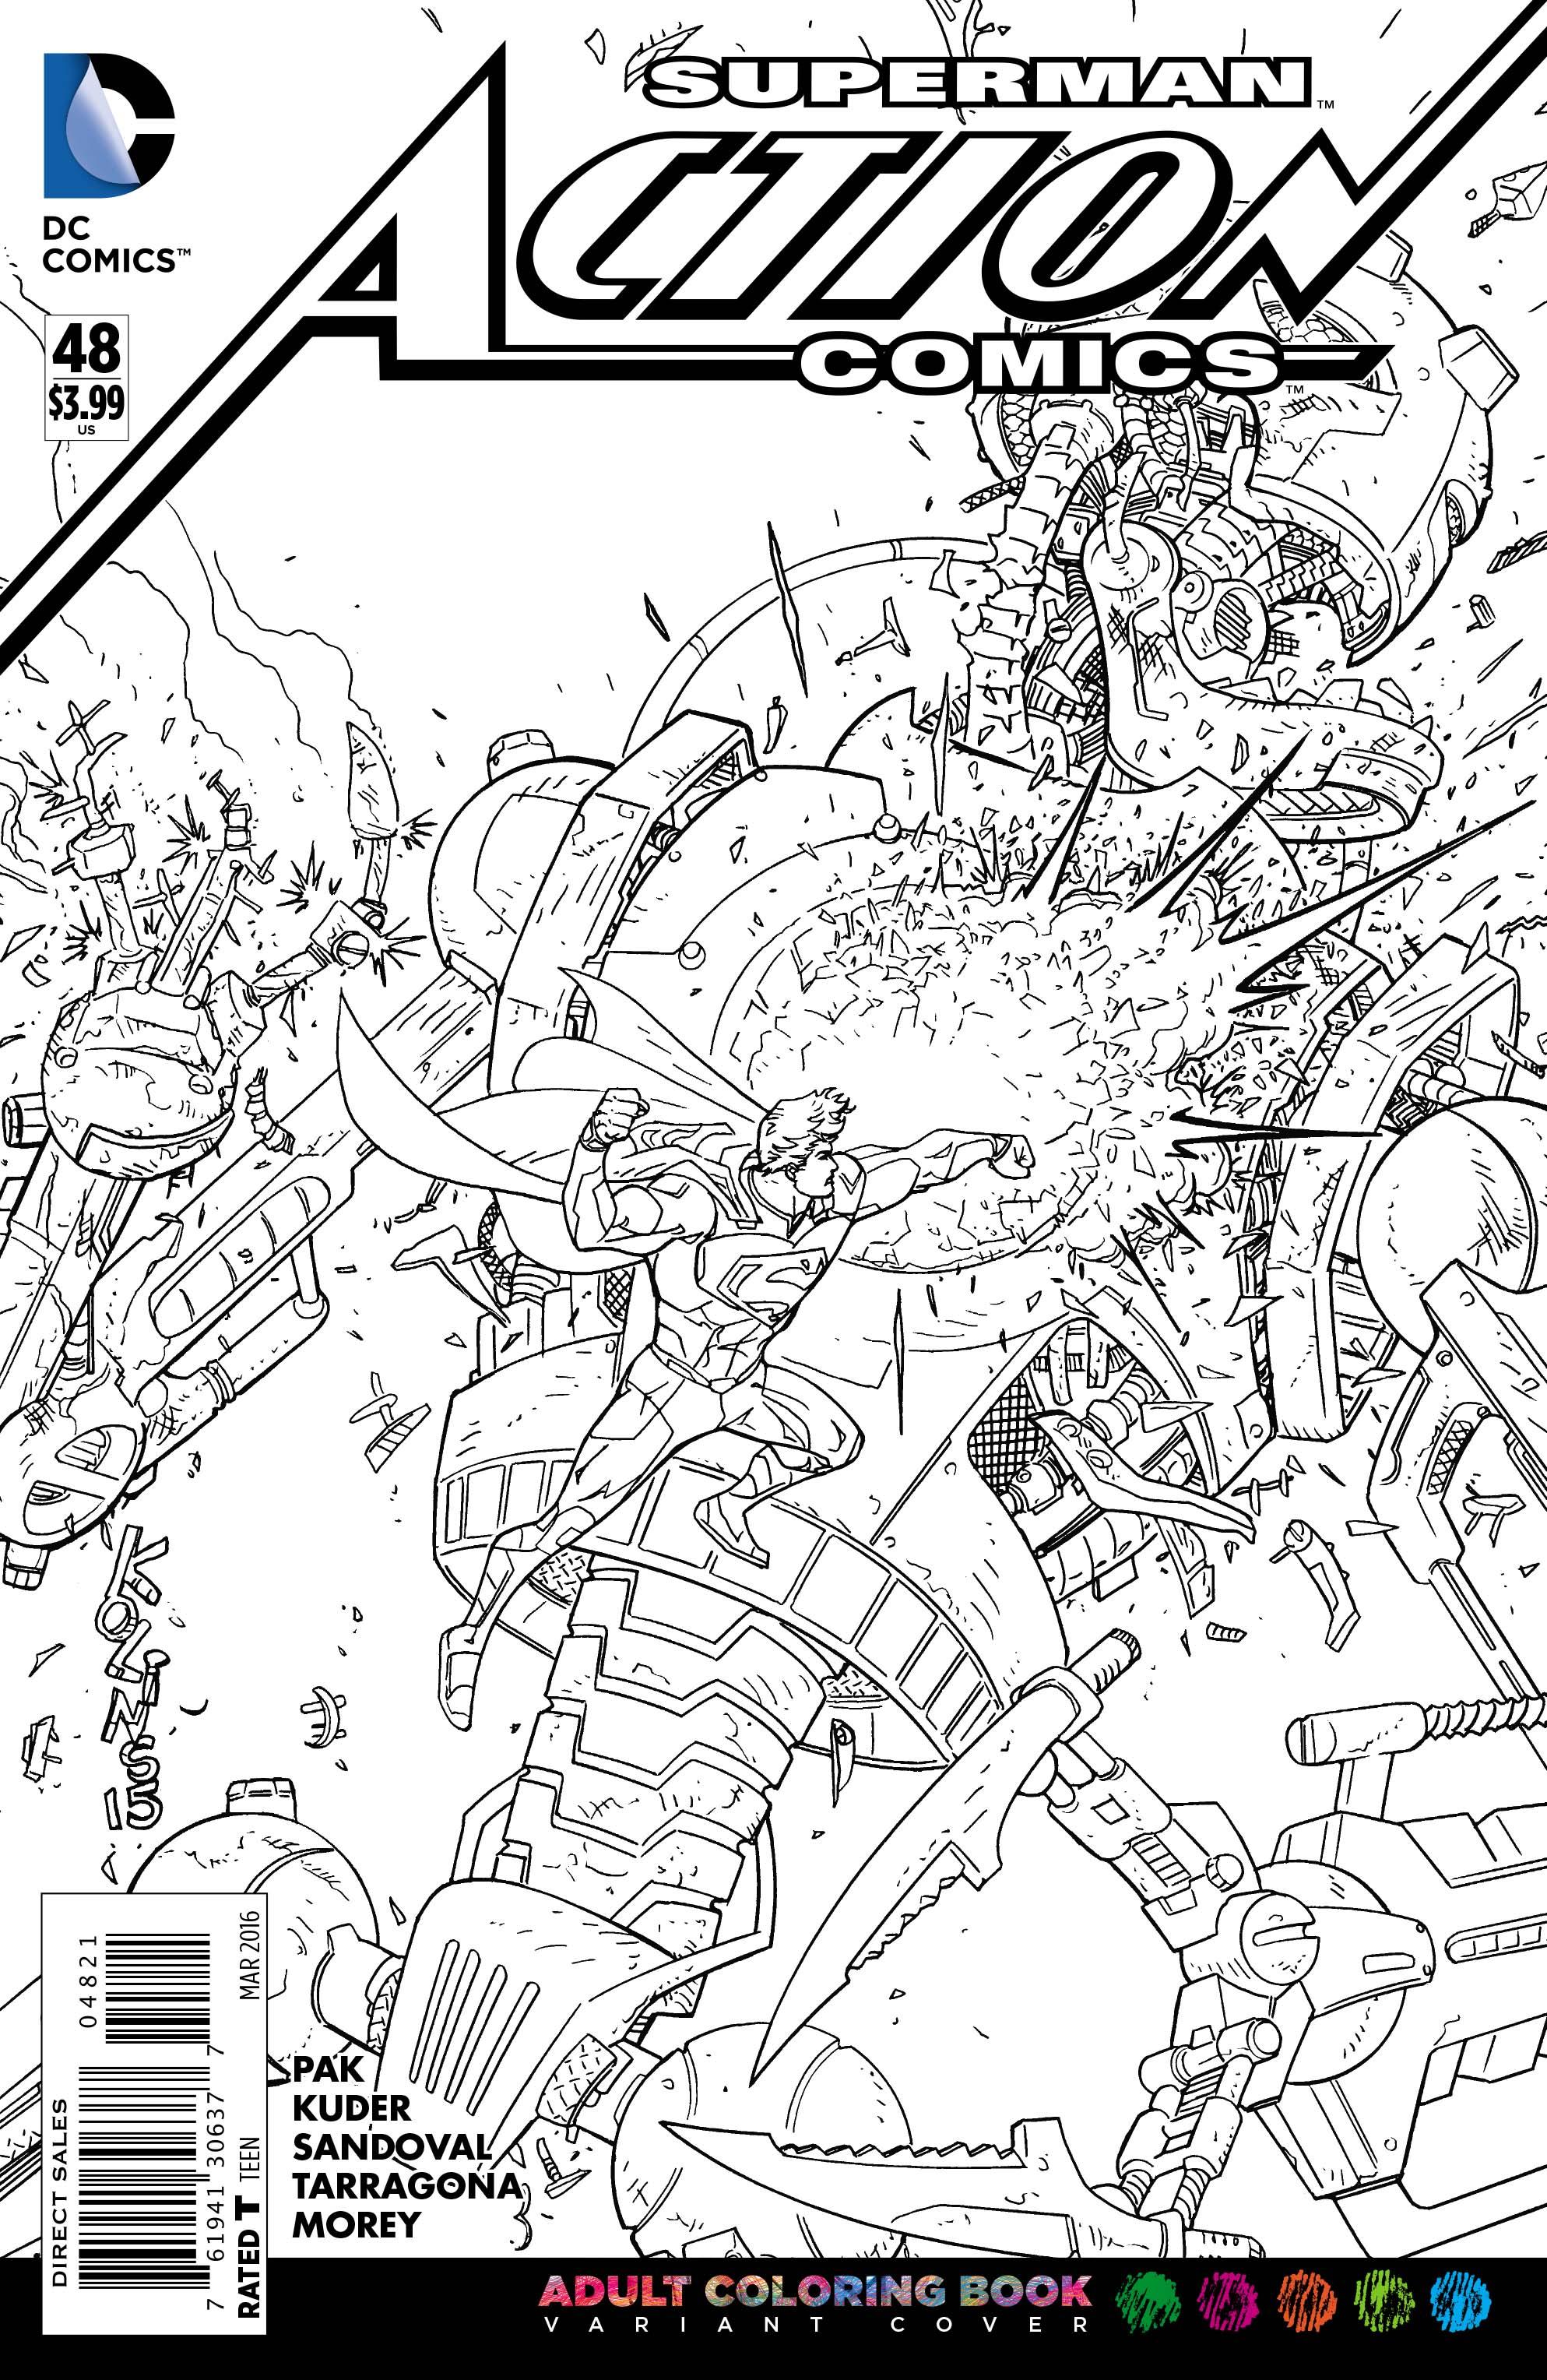 dc comics adult coloring book variants revealed